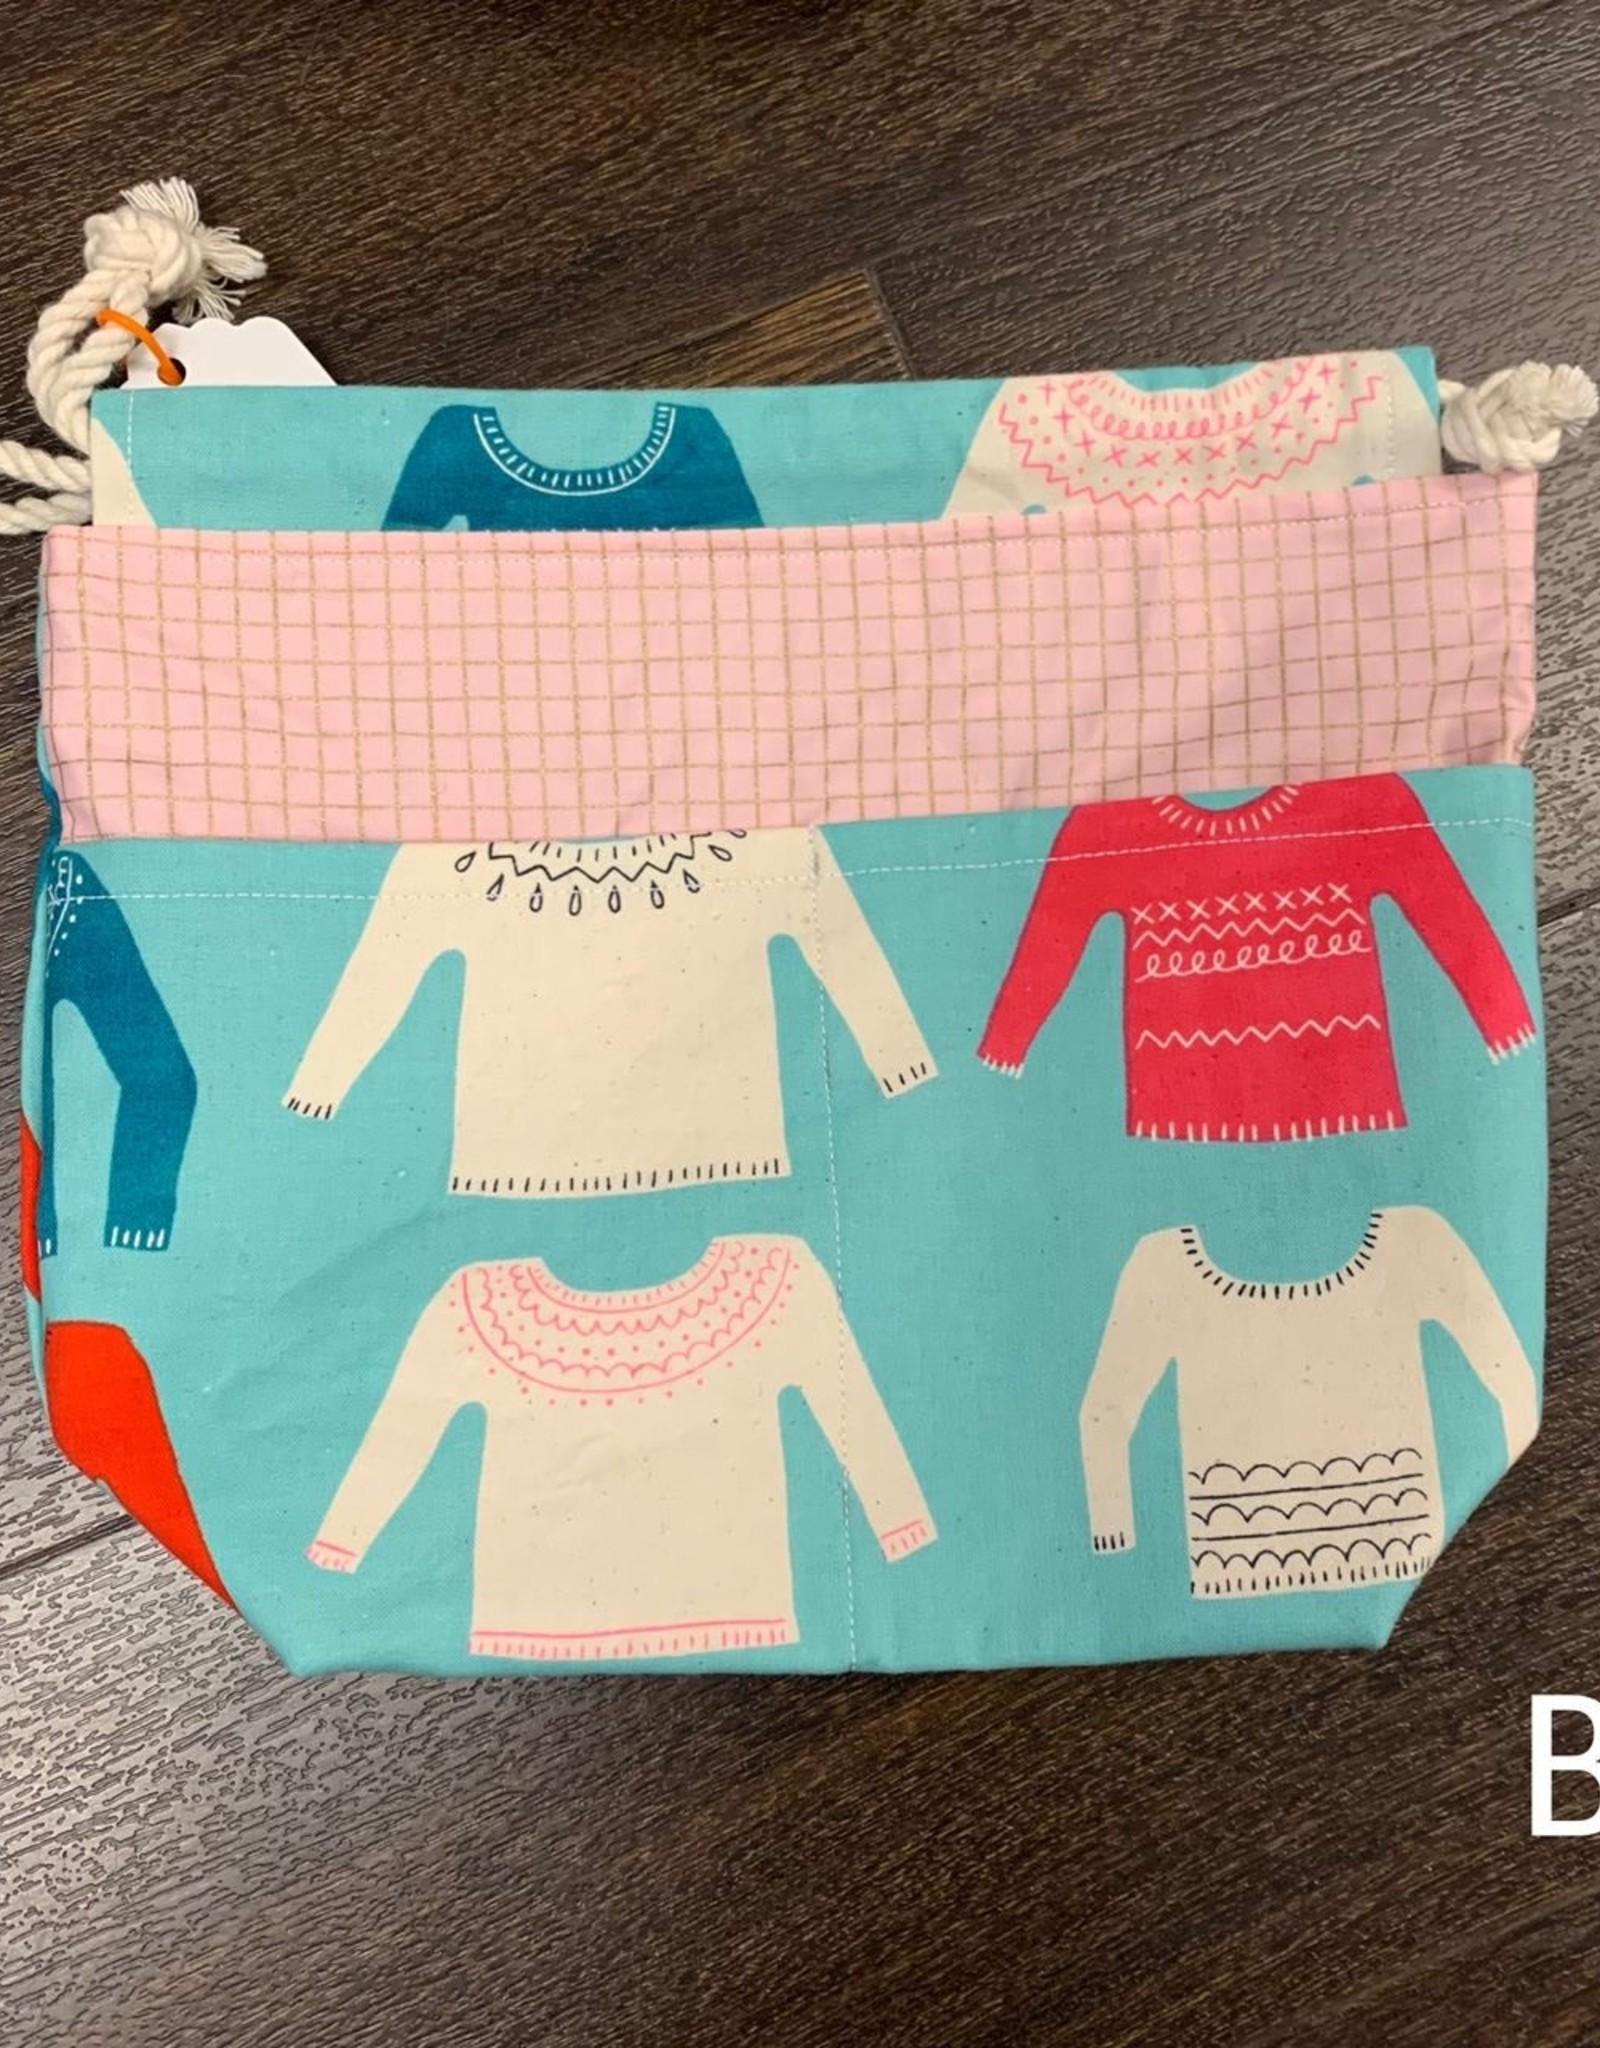 Handmade Drawstring Project Bags